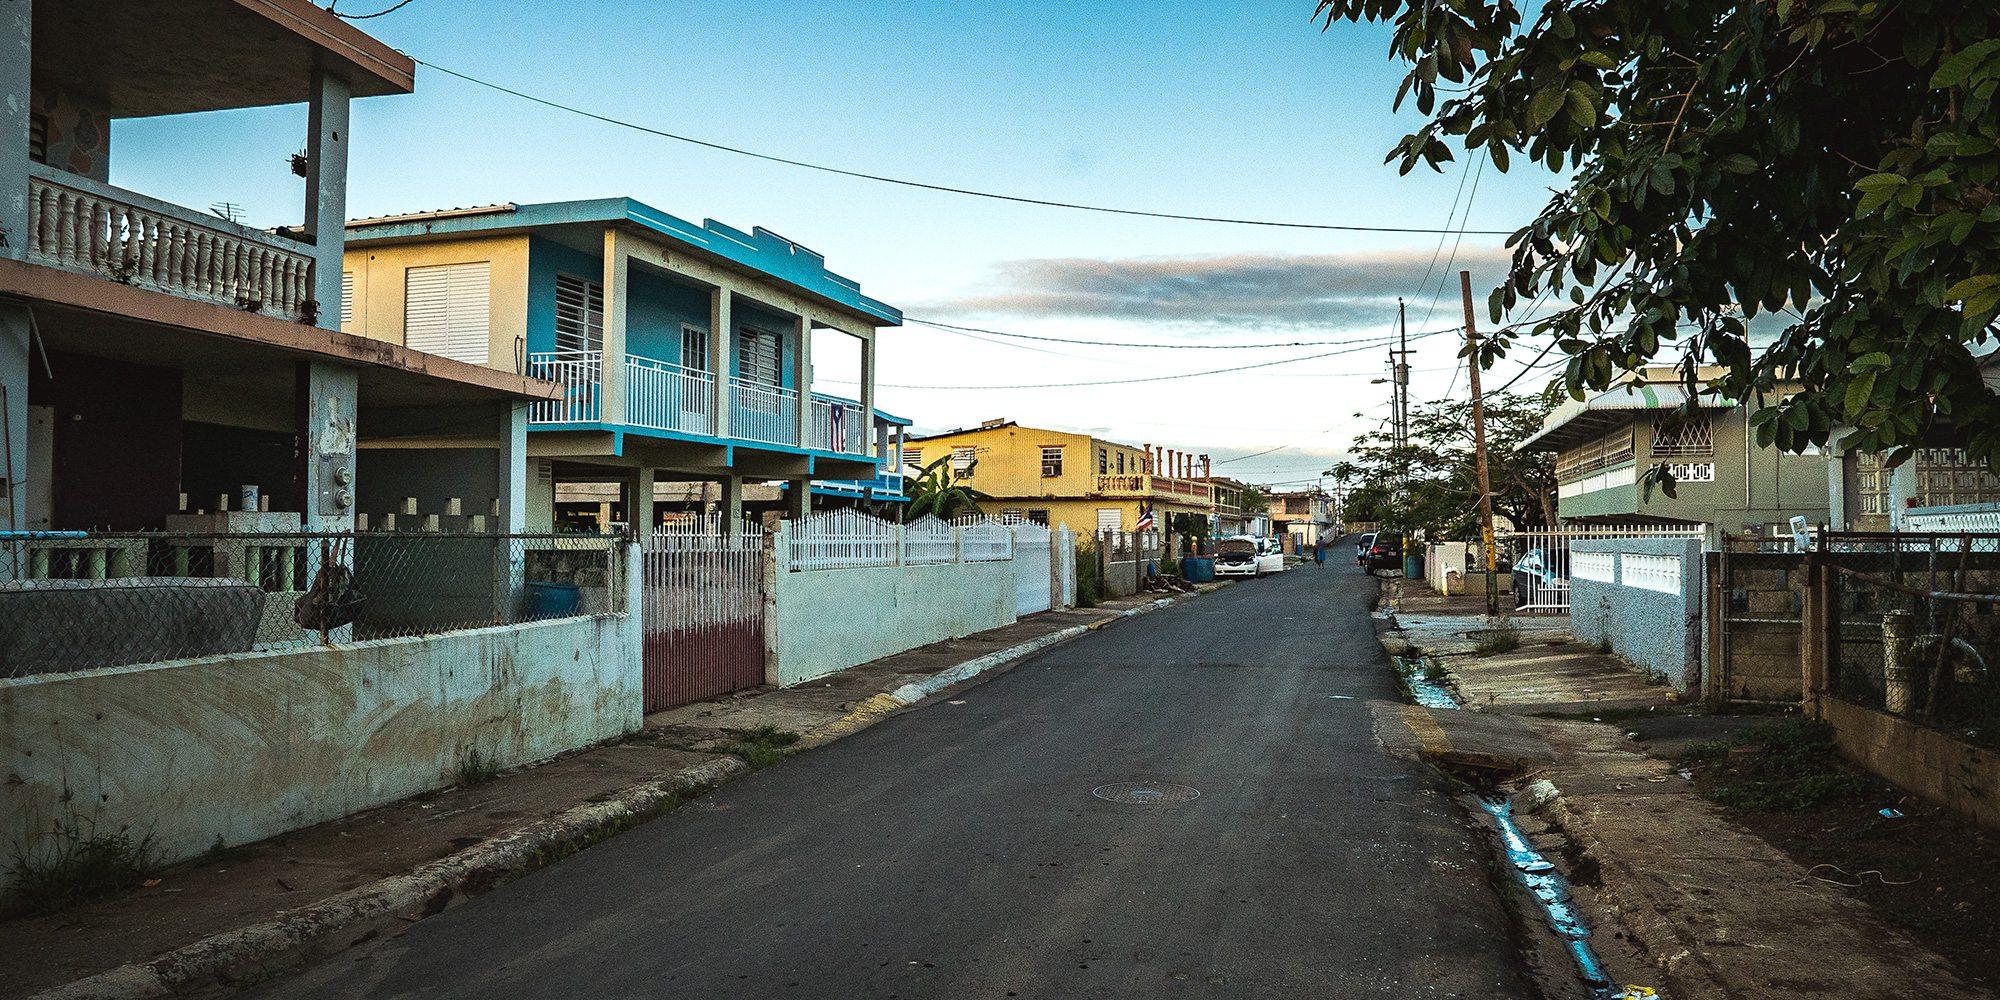 Residential street in Puerto Rico